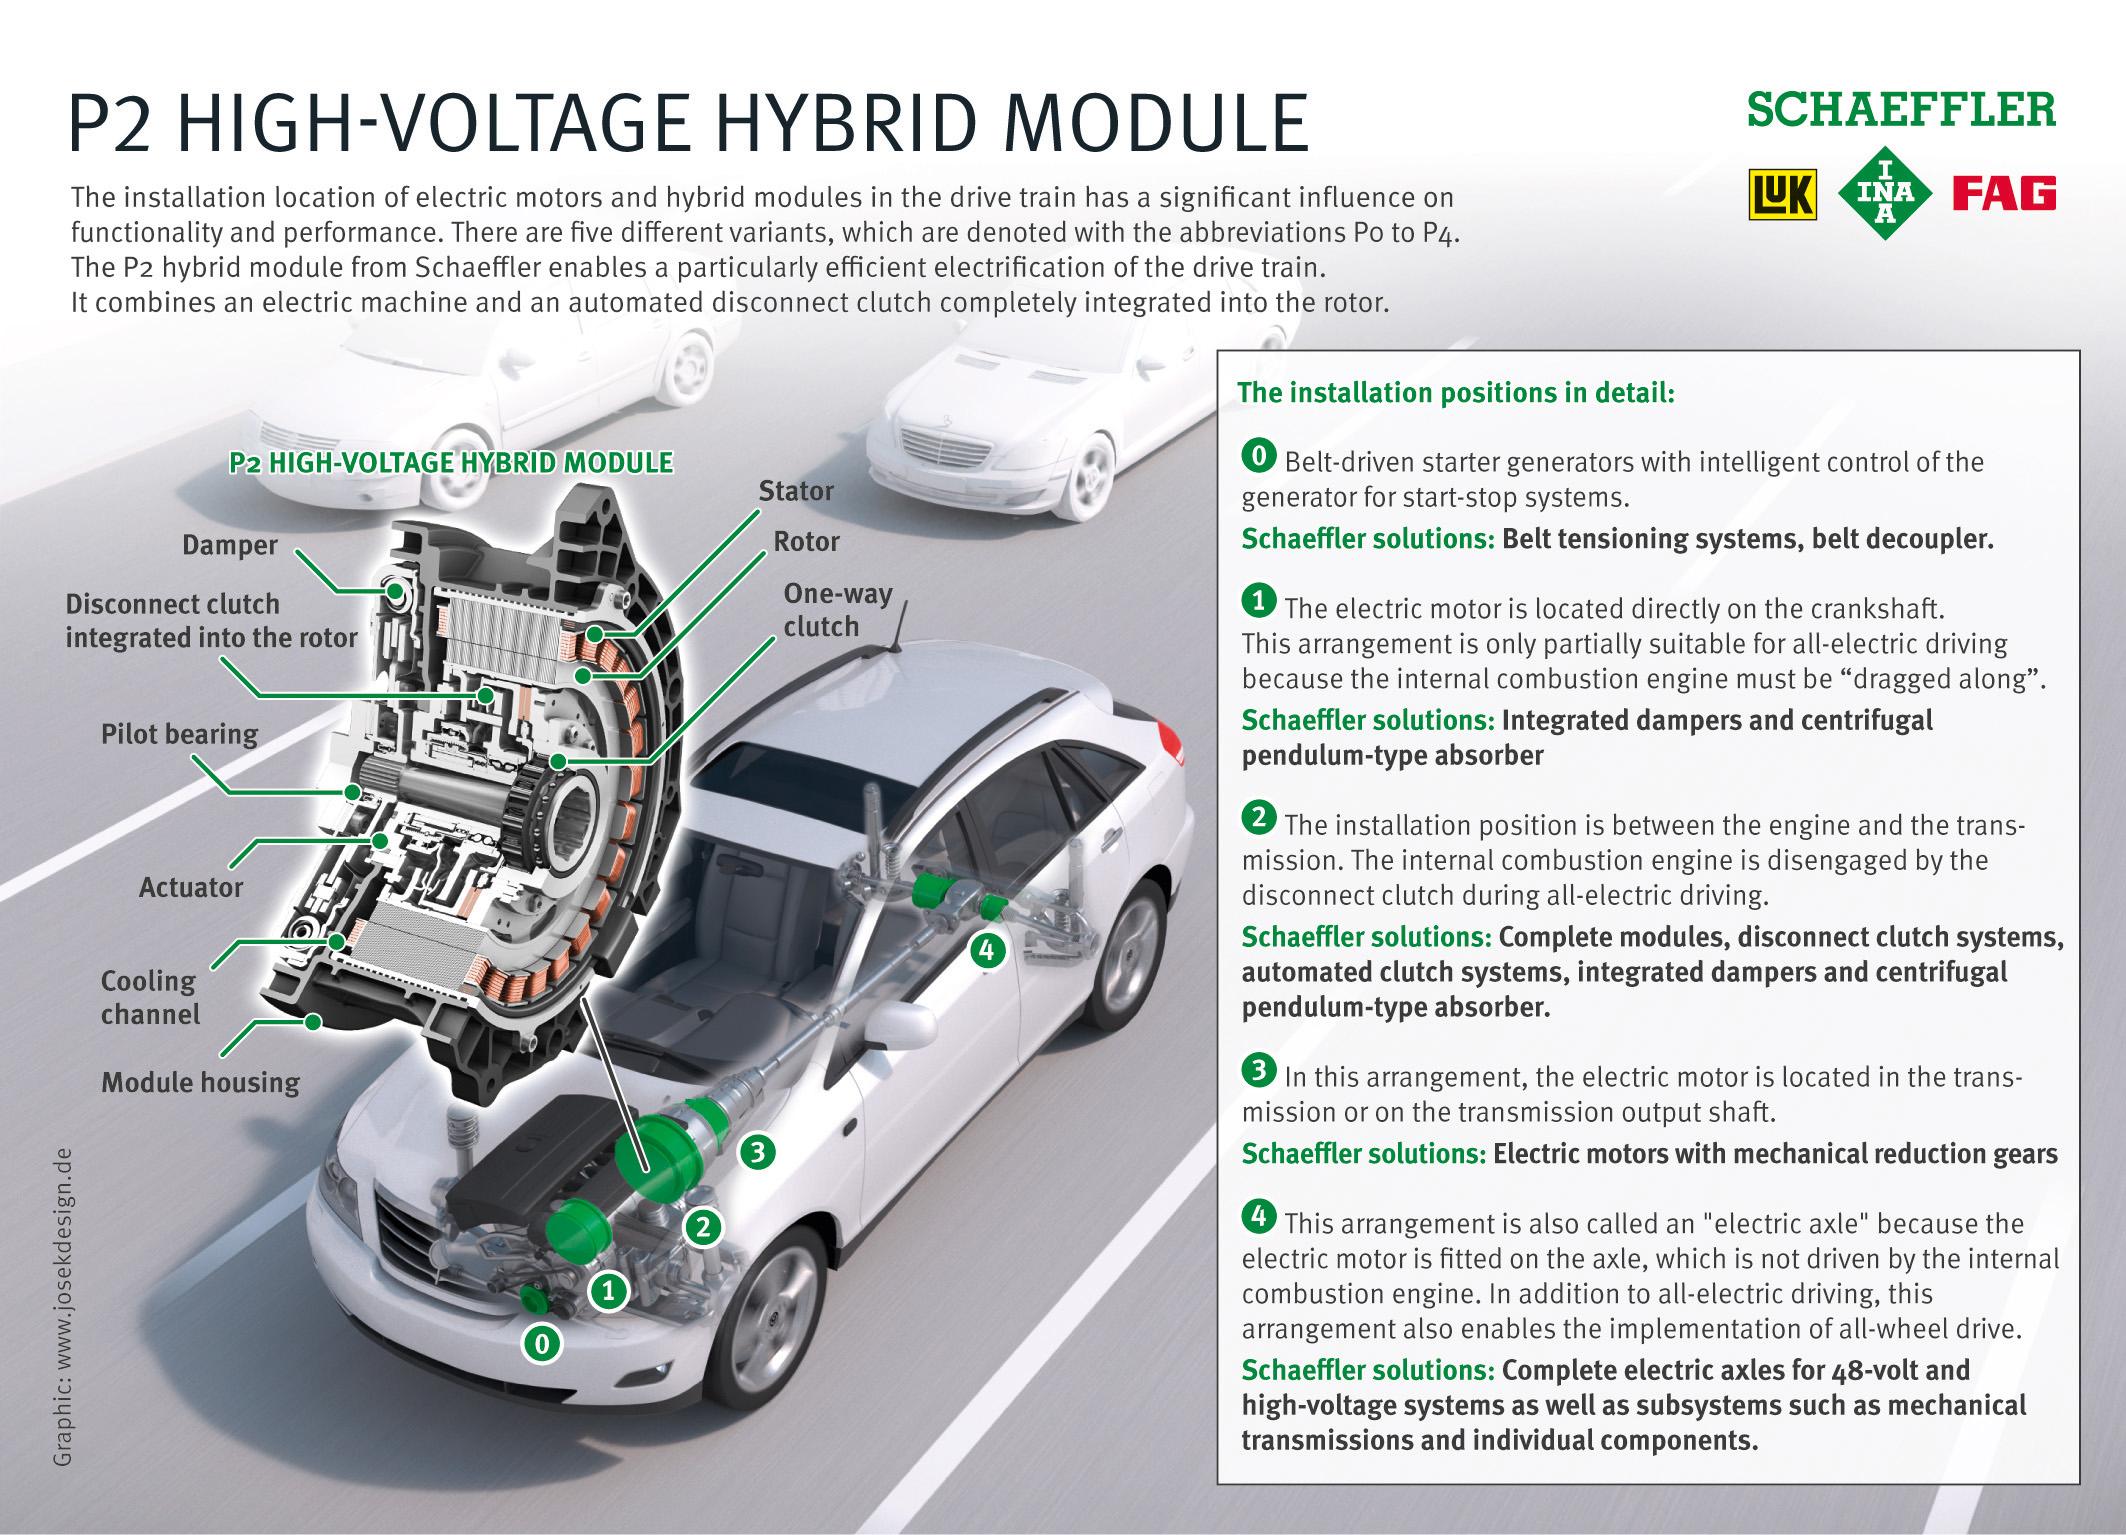 P2 high-voltage hybrid module infographic